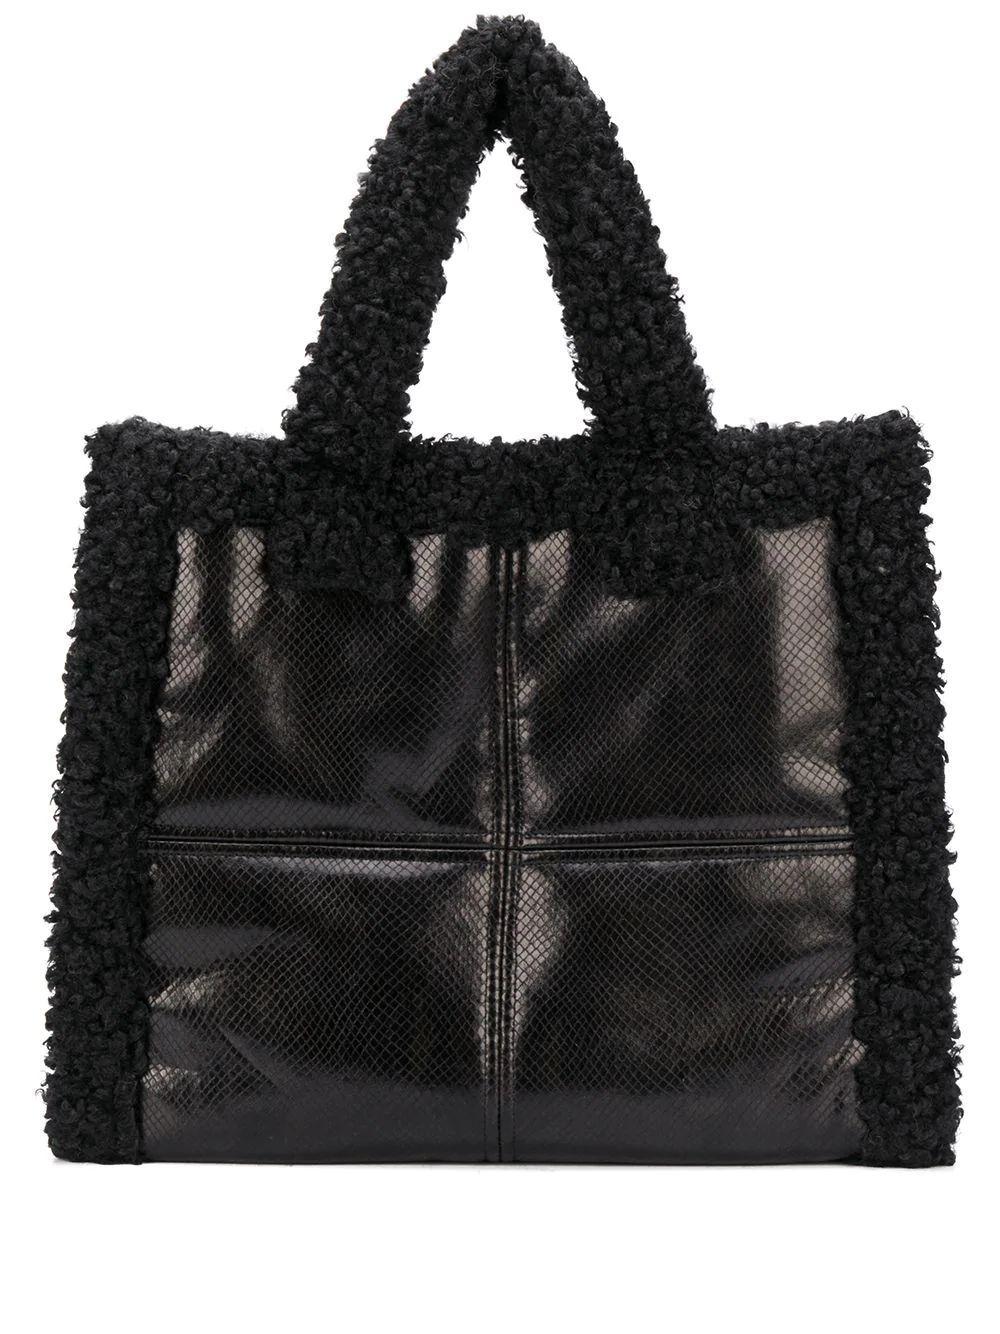 Lolita Shearling Snake Print Bag Item # 61203-9050